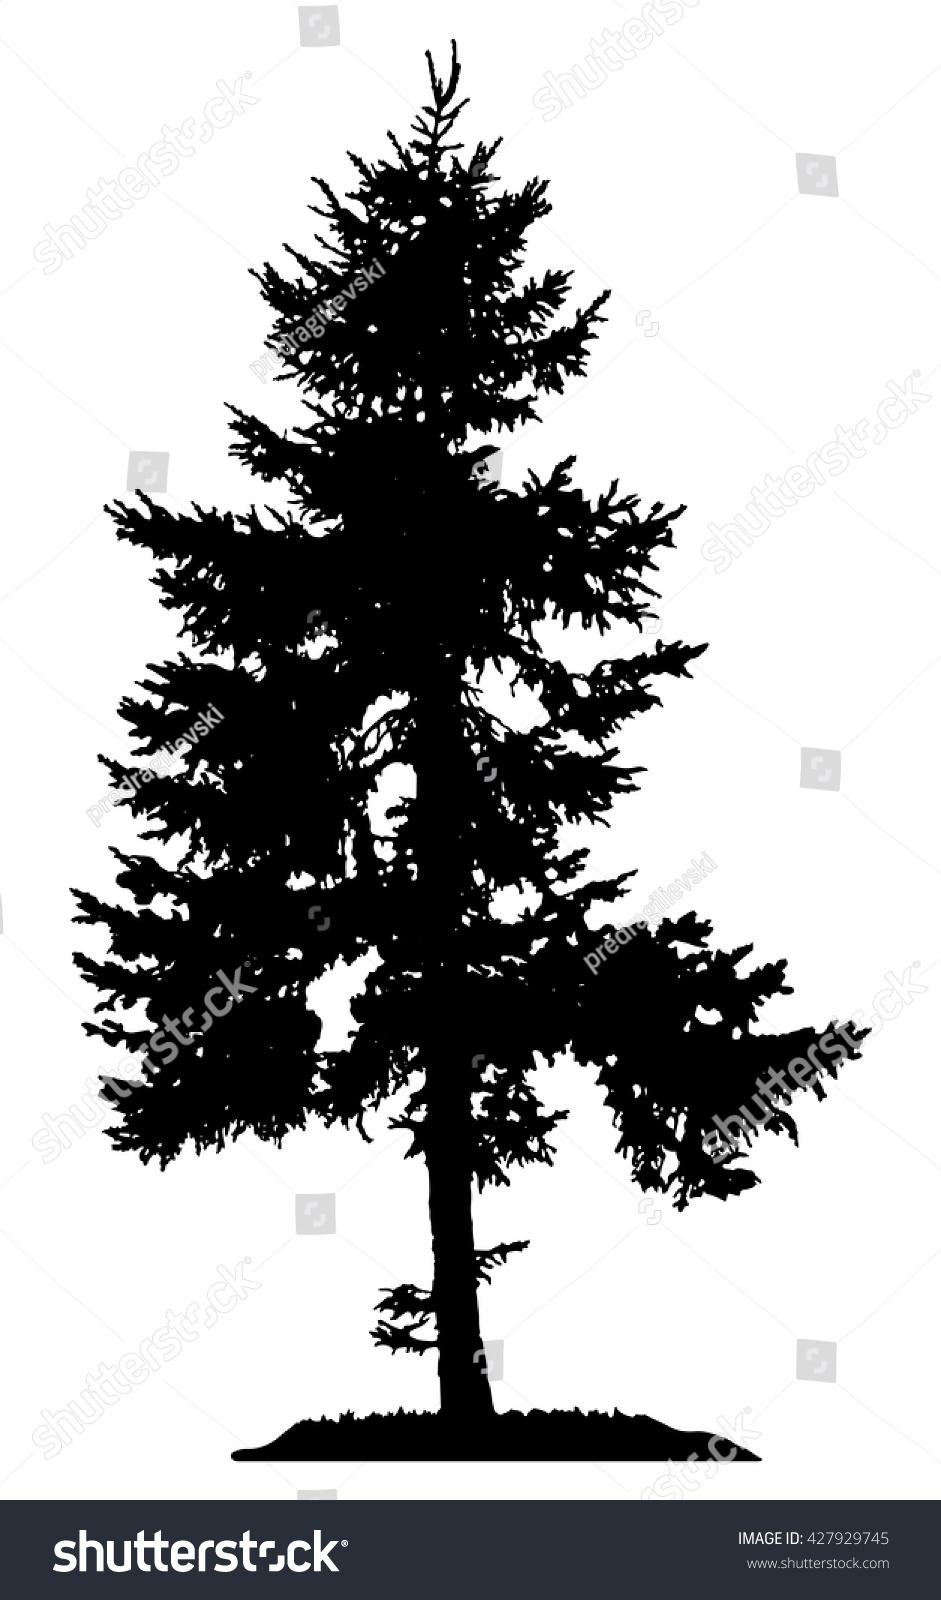 pine tree silhouette stock vector 427929745 shutterstock vector pine trees free vector images of pine trees